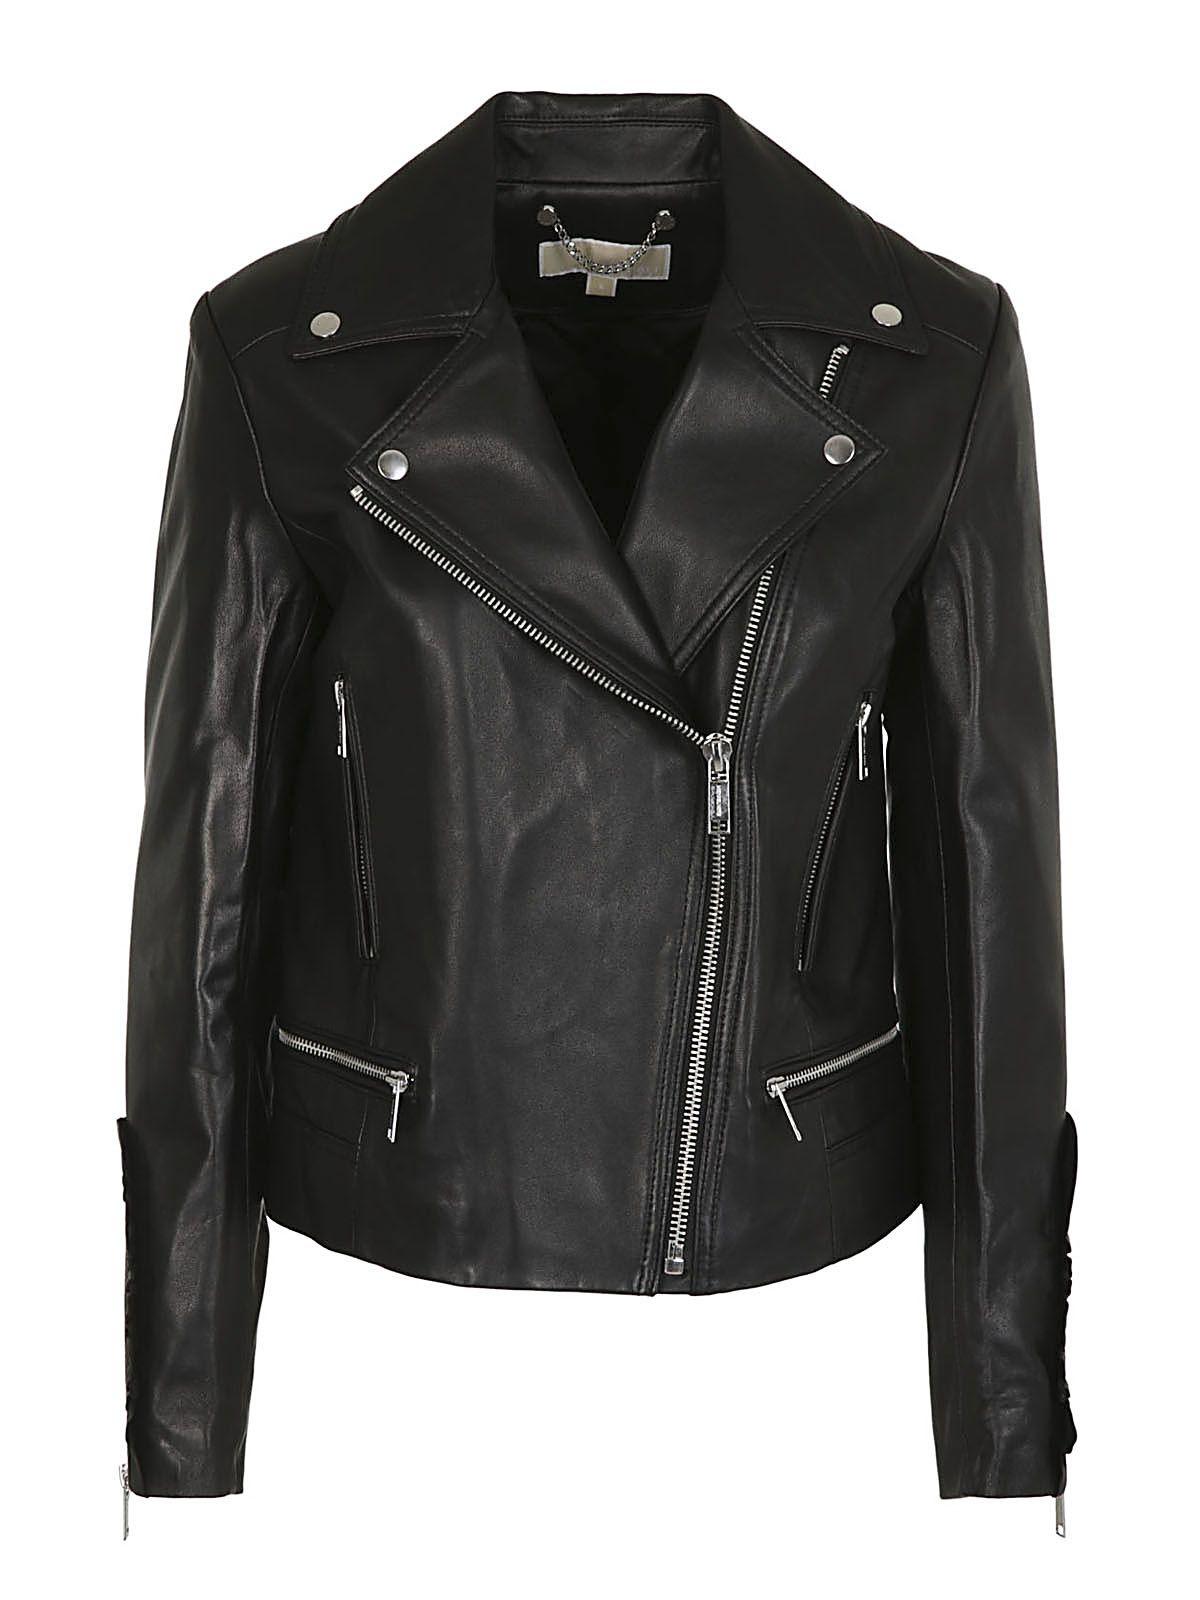 Michael Kors Frill-trimmed Biker Jacket